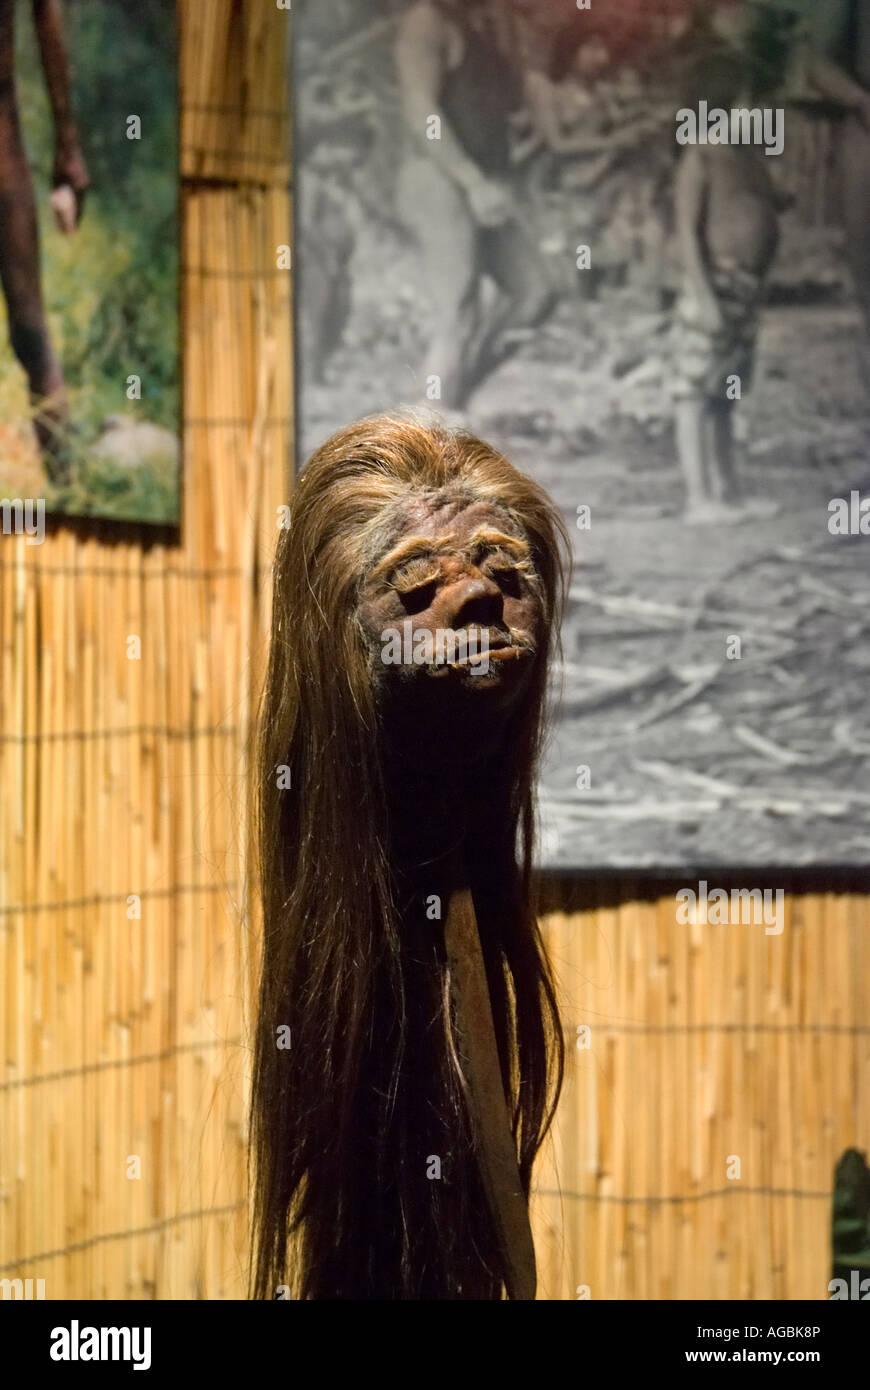 Tête humaine ratatinée Ripley s Believe It Or Not Museum St Augustine en Floride Photo Stock